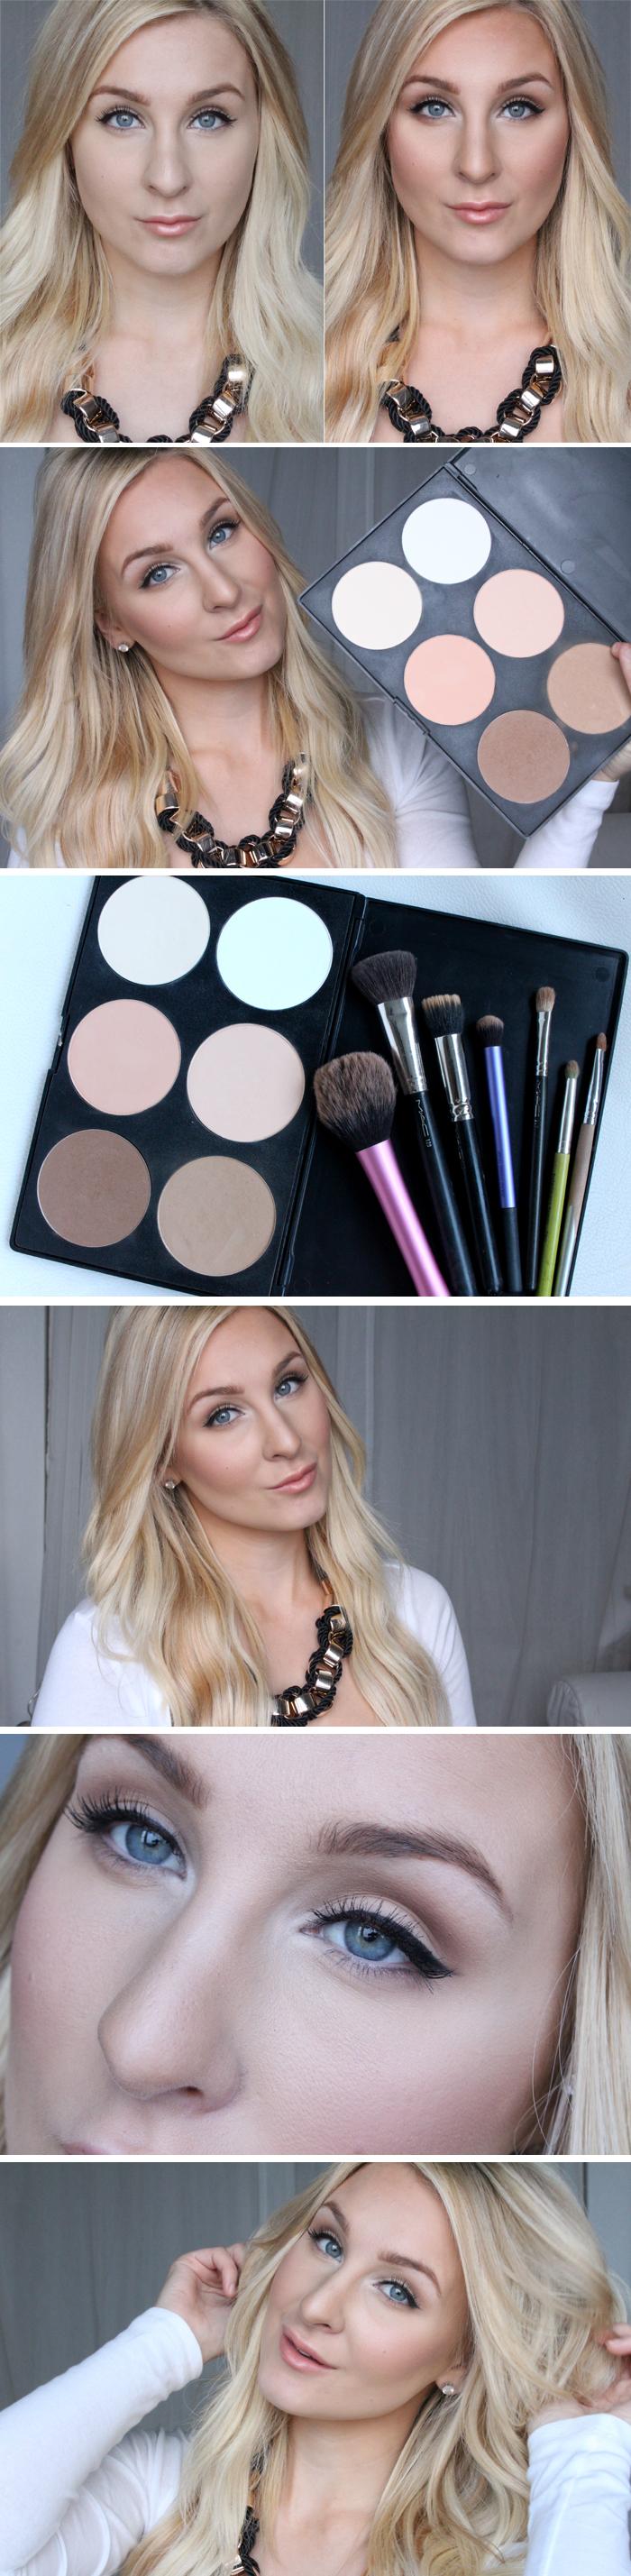 How To Use €� Contour & Highlight Kit! En M�ste Ha Produkt!